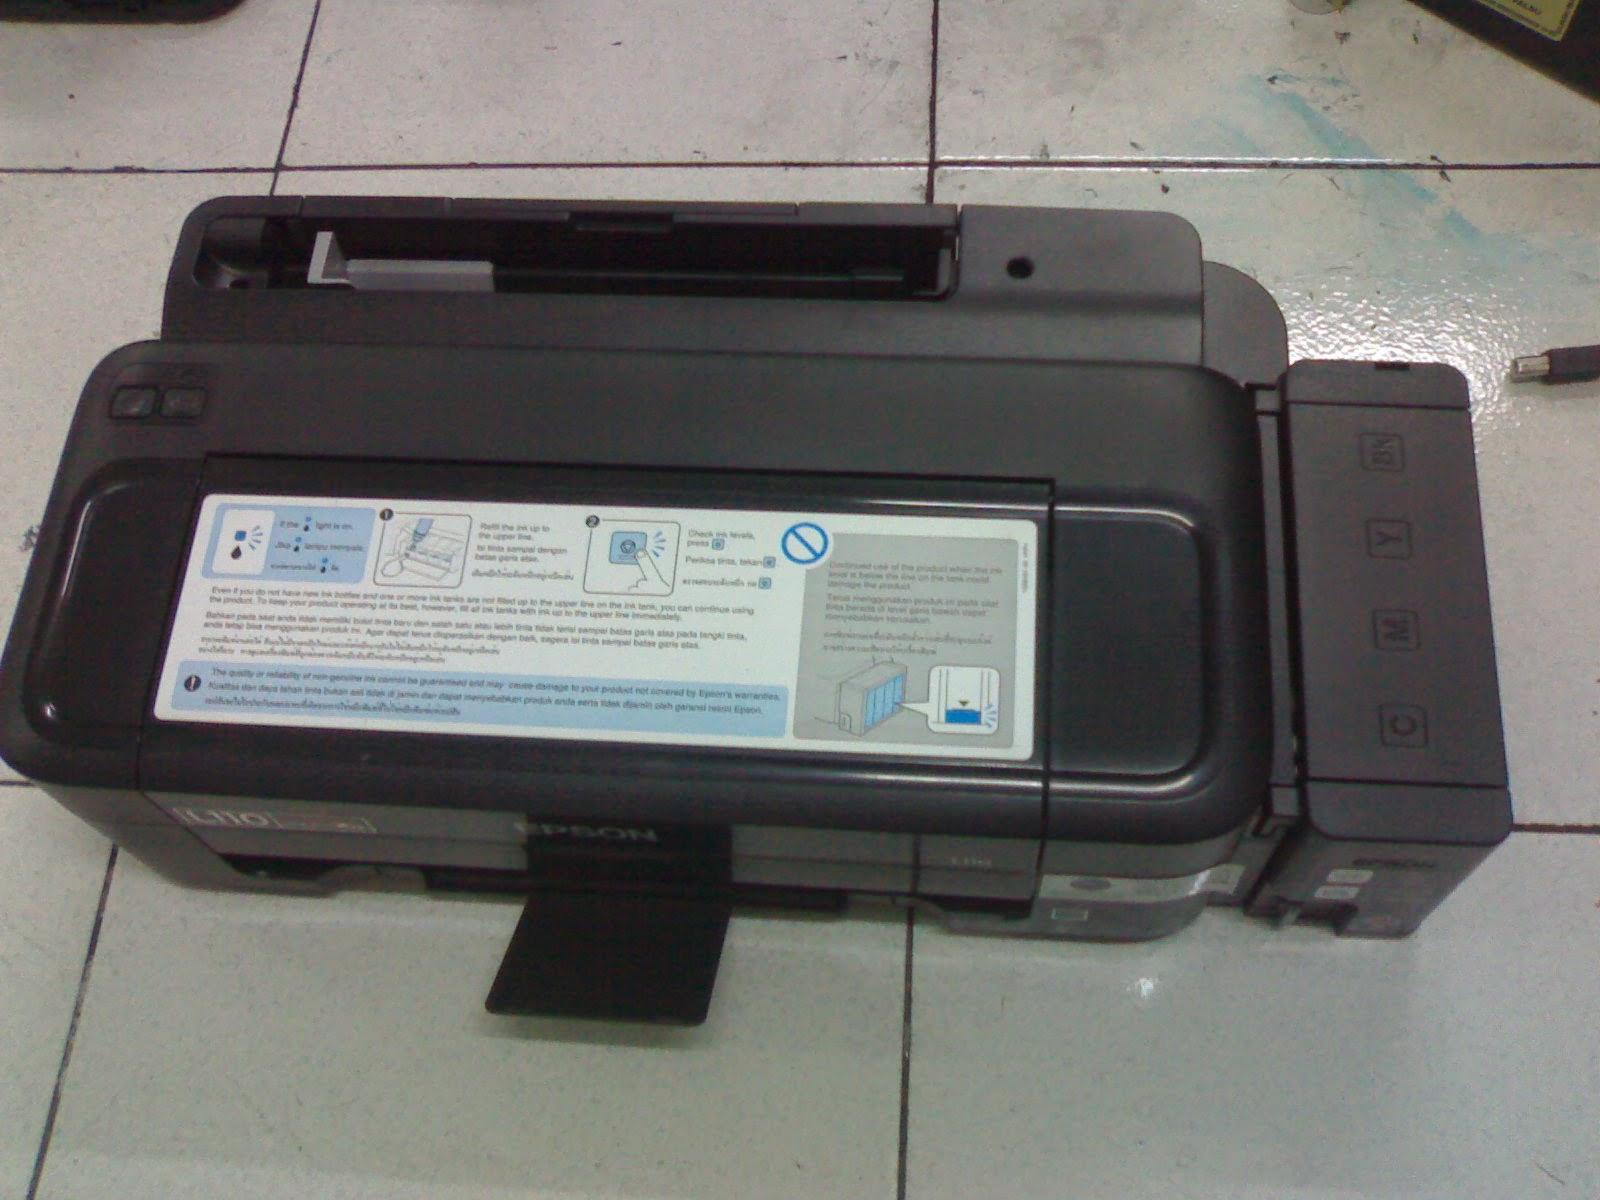 Cara Mangatasi Lampu Indikator Tinta Printer Epson L110 L300 L210 L310 L 310 Seri Blinking Terus